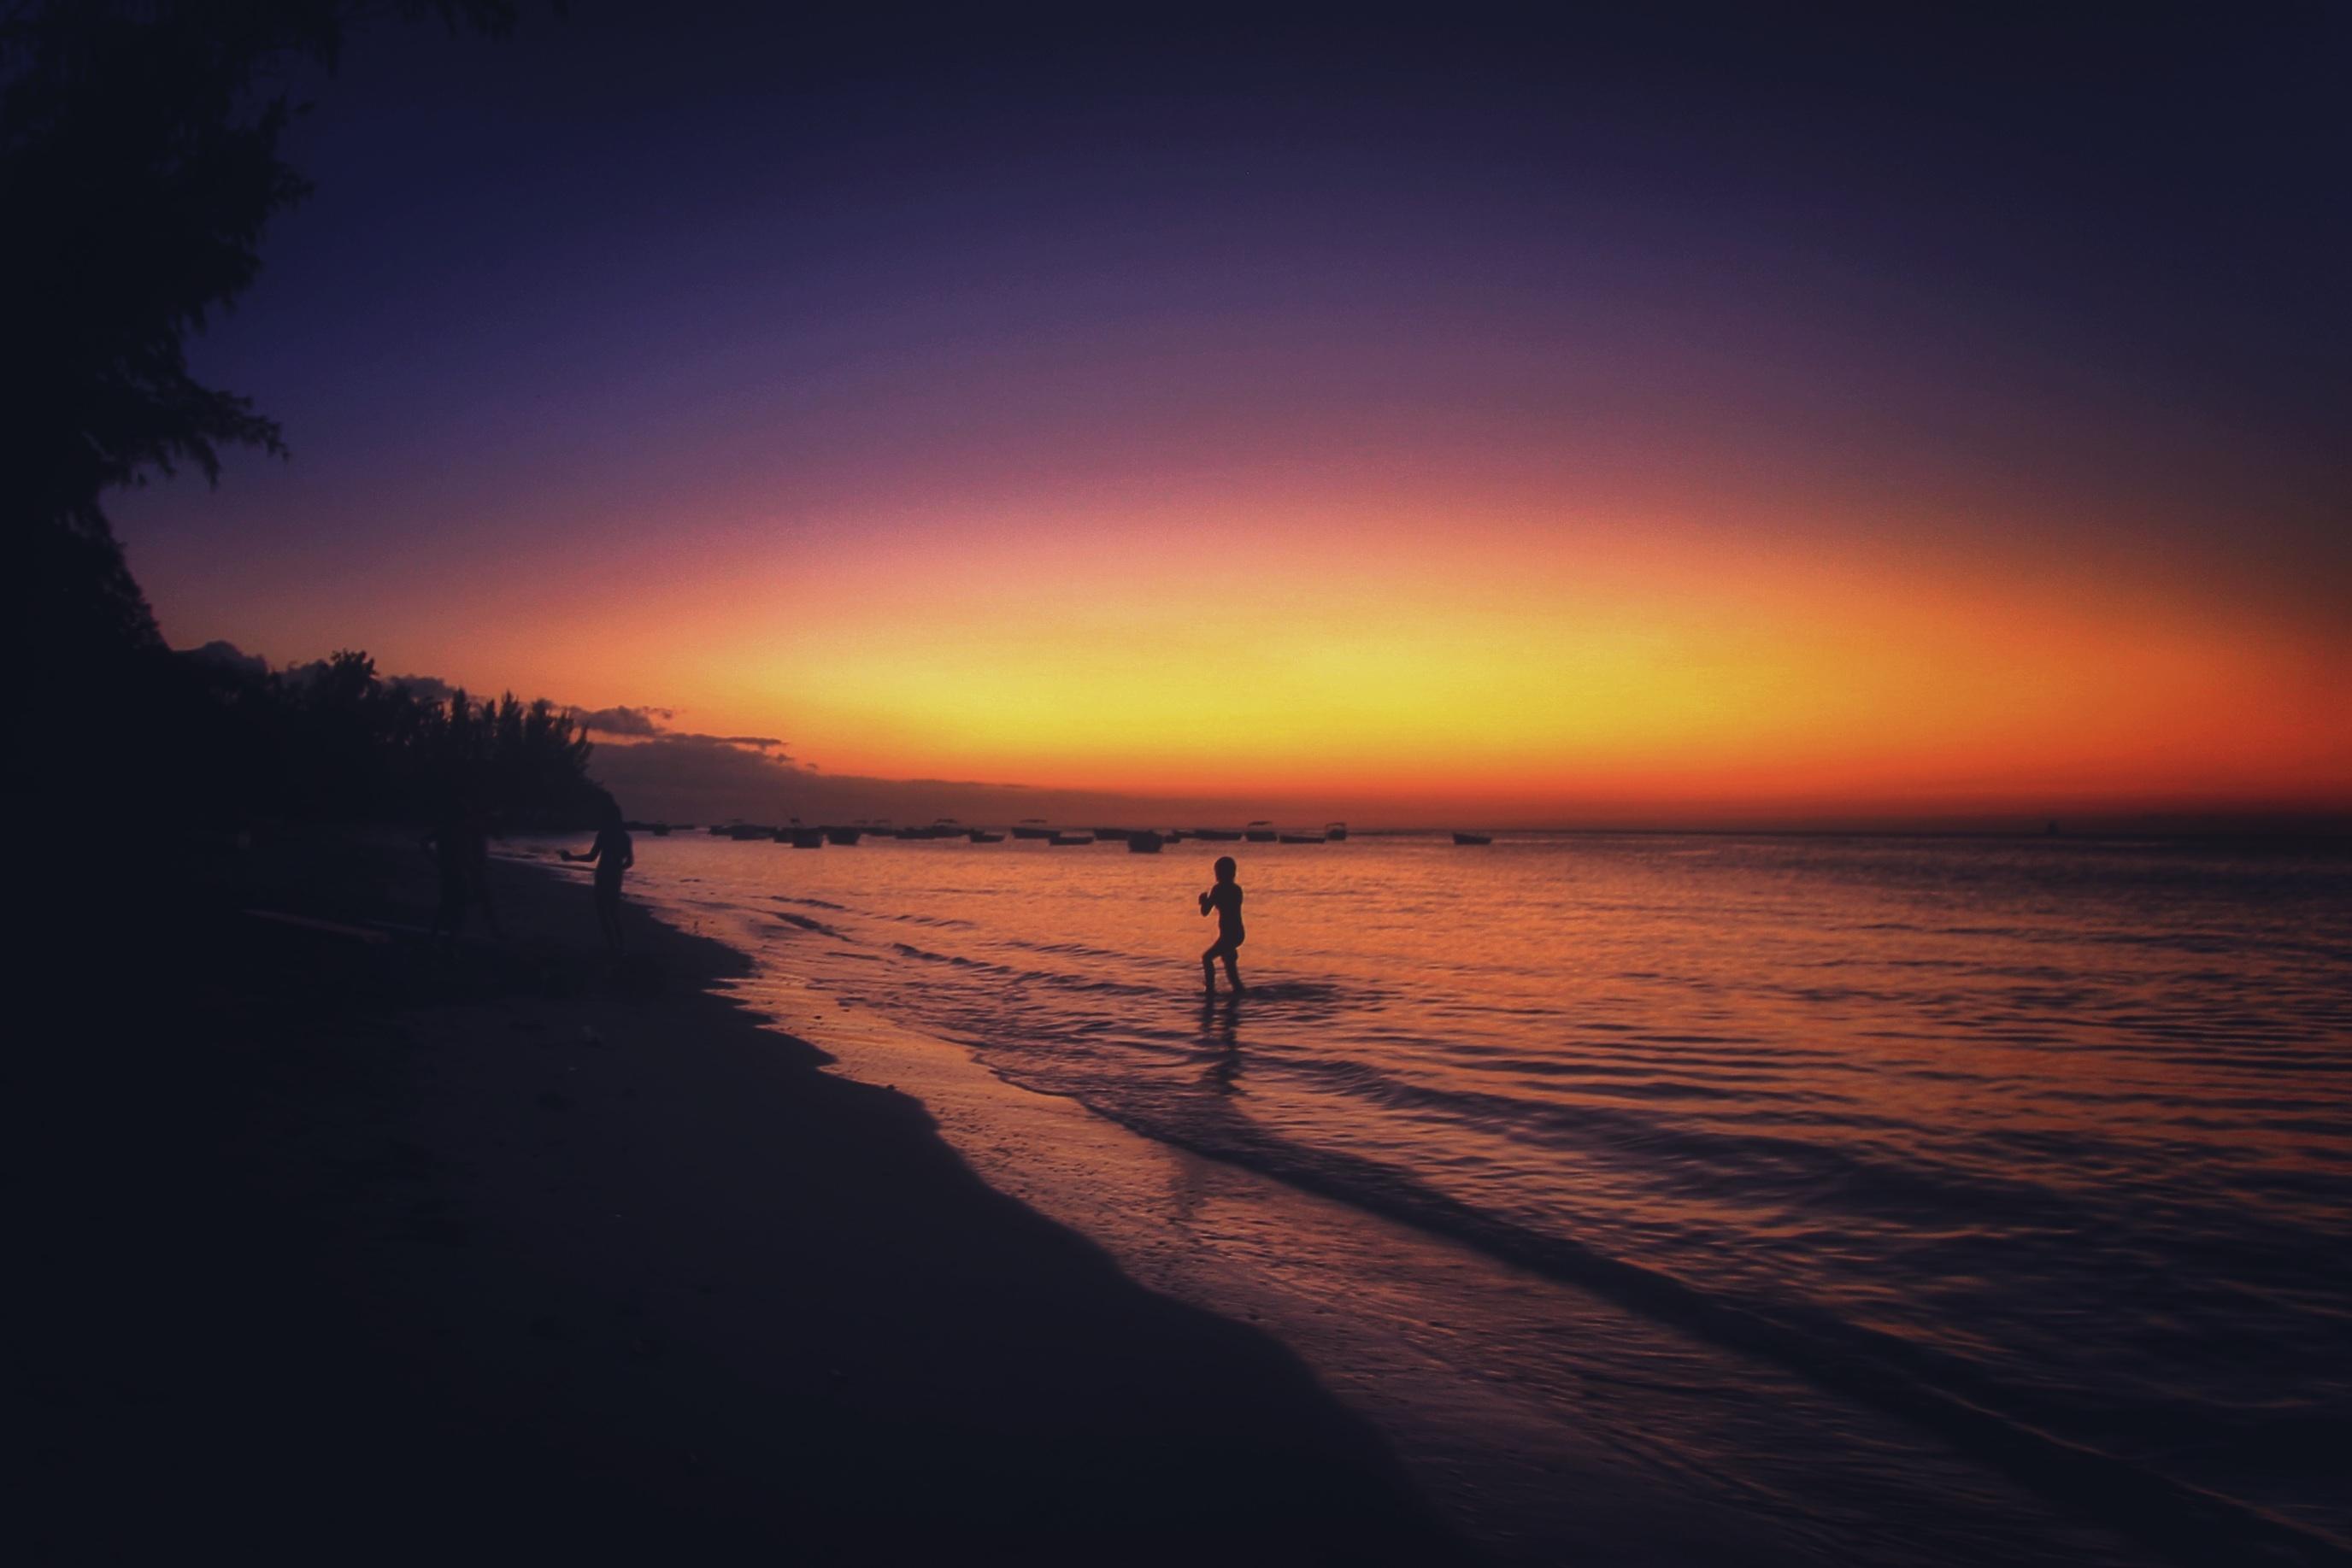 Summer Beach Landscape Image